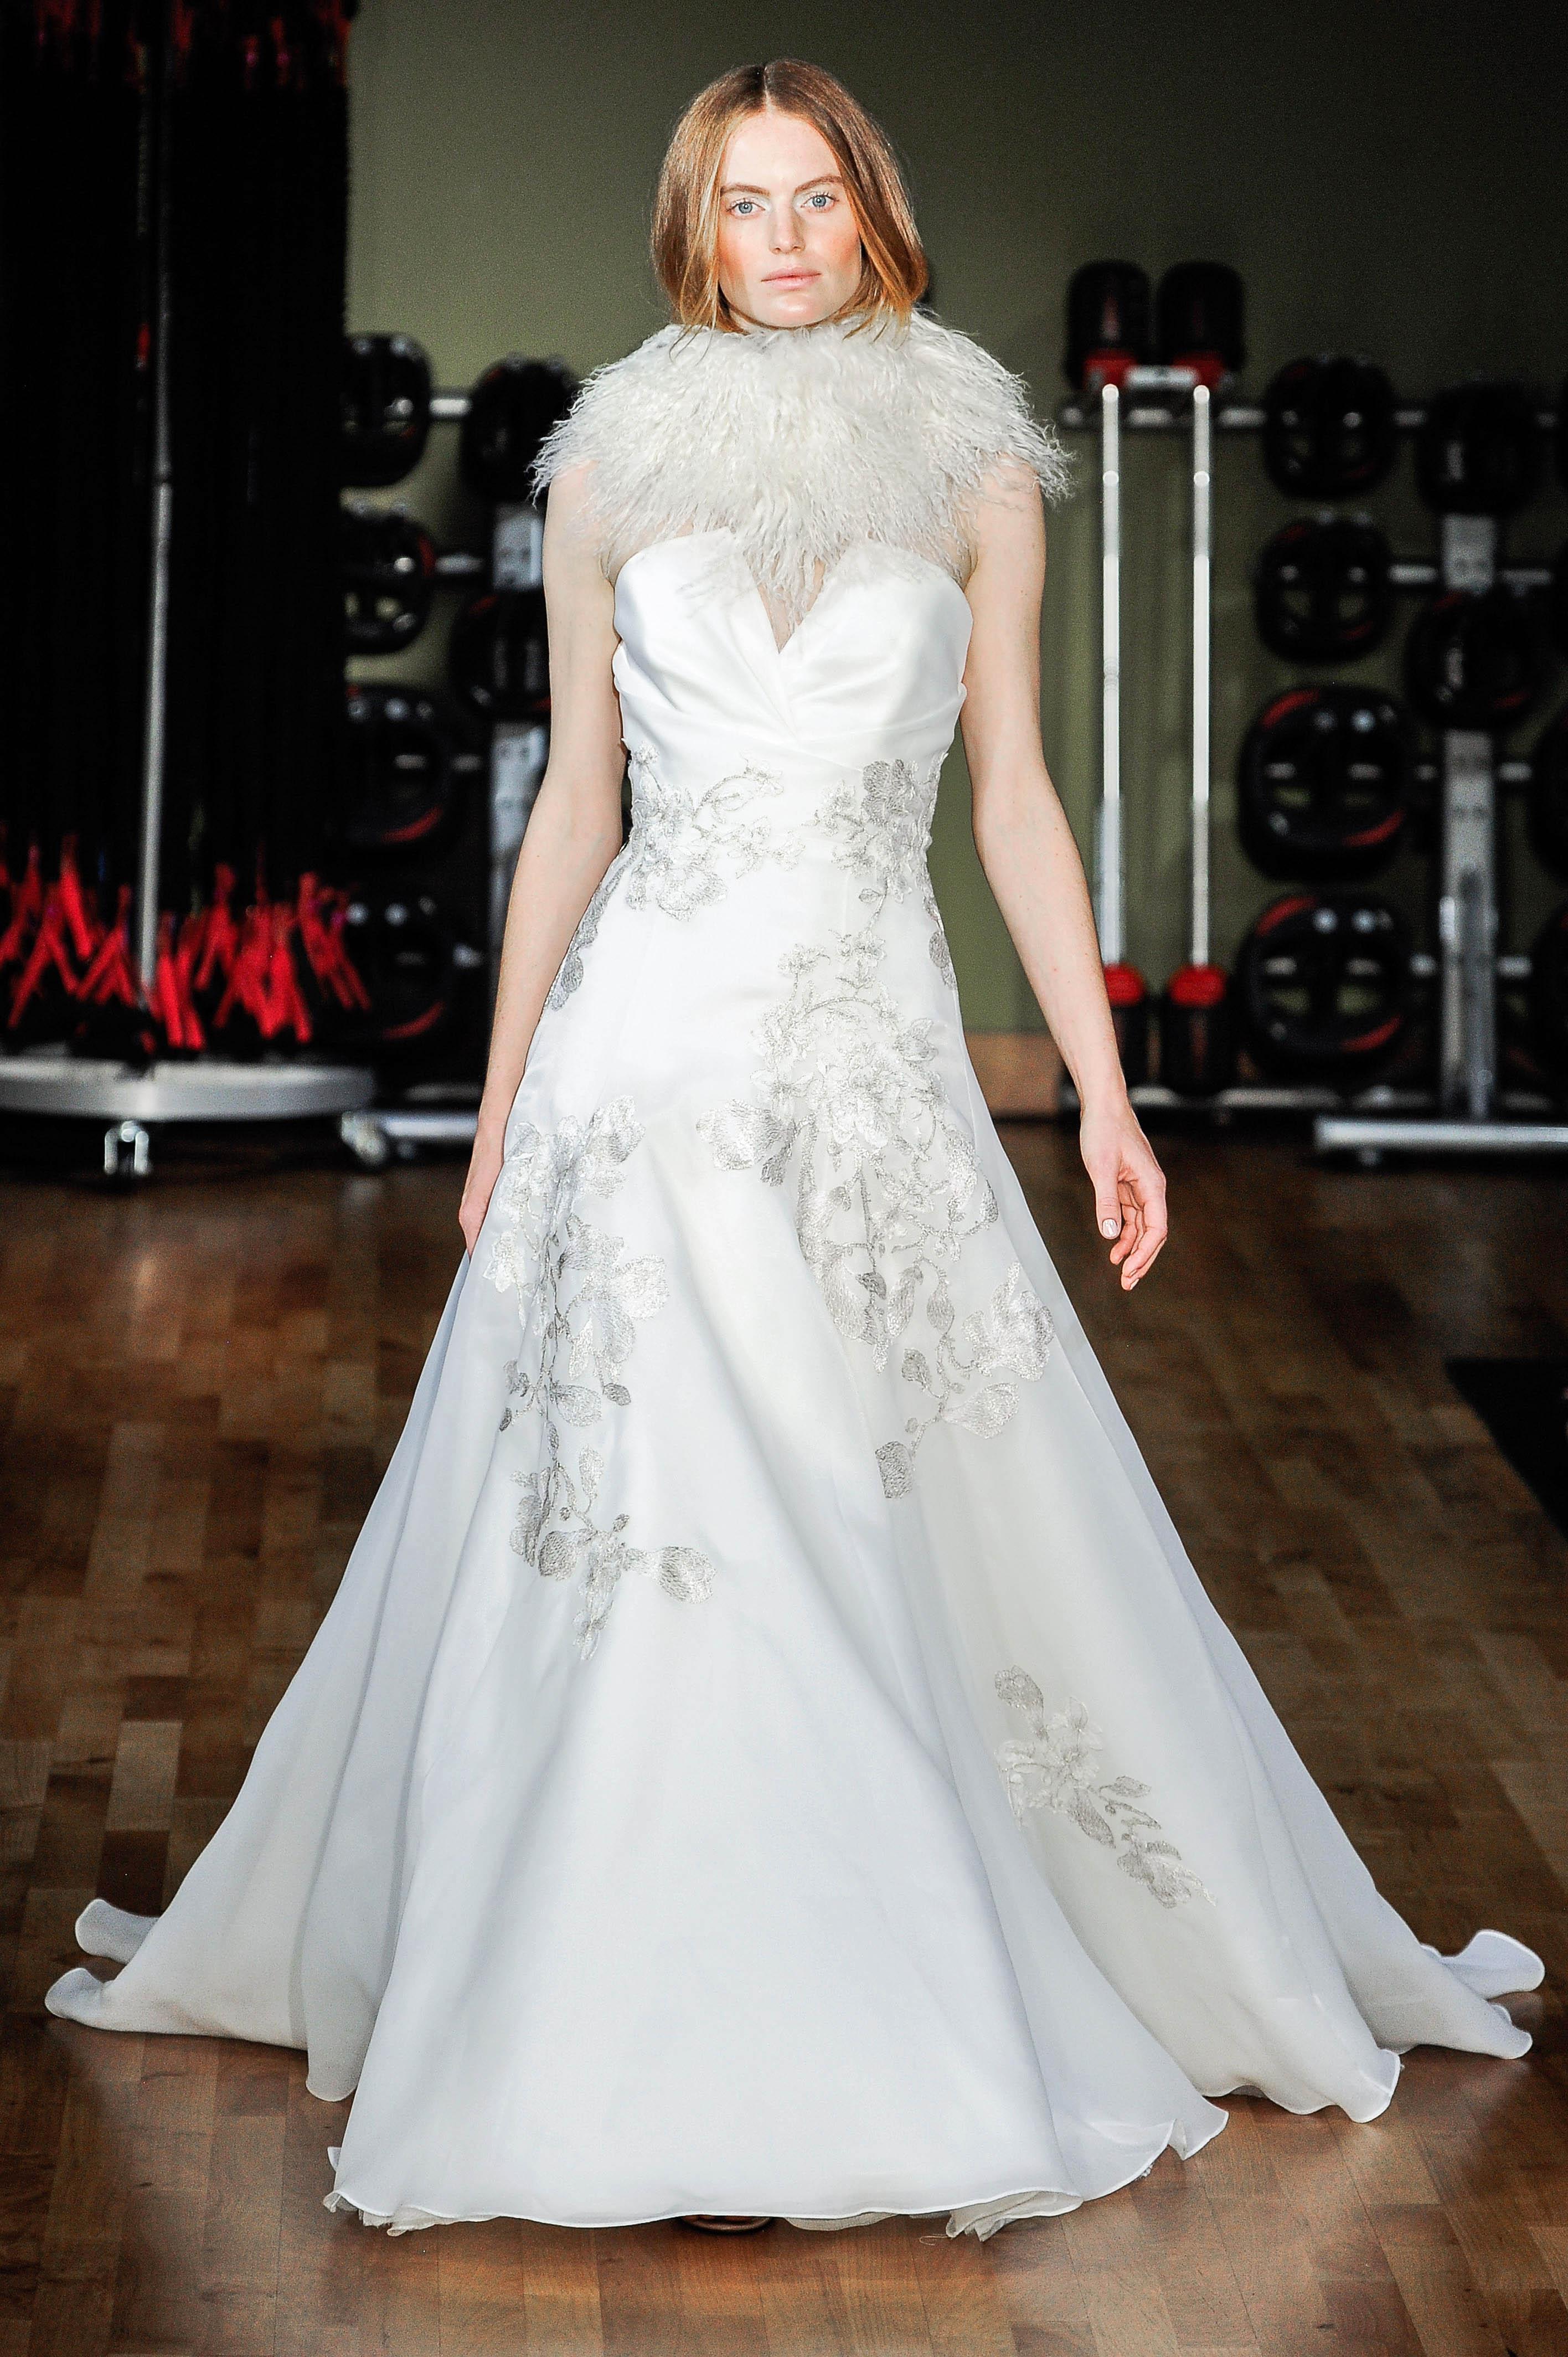 rivini by rita vinieris wedding dress fall 2018 strapless v-neck embellished feather neck piece